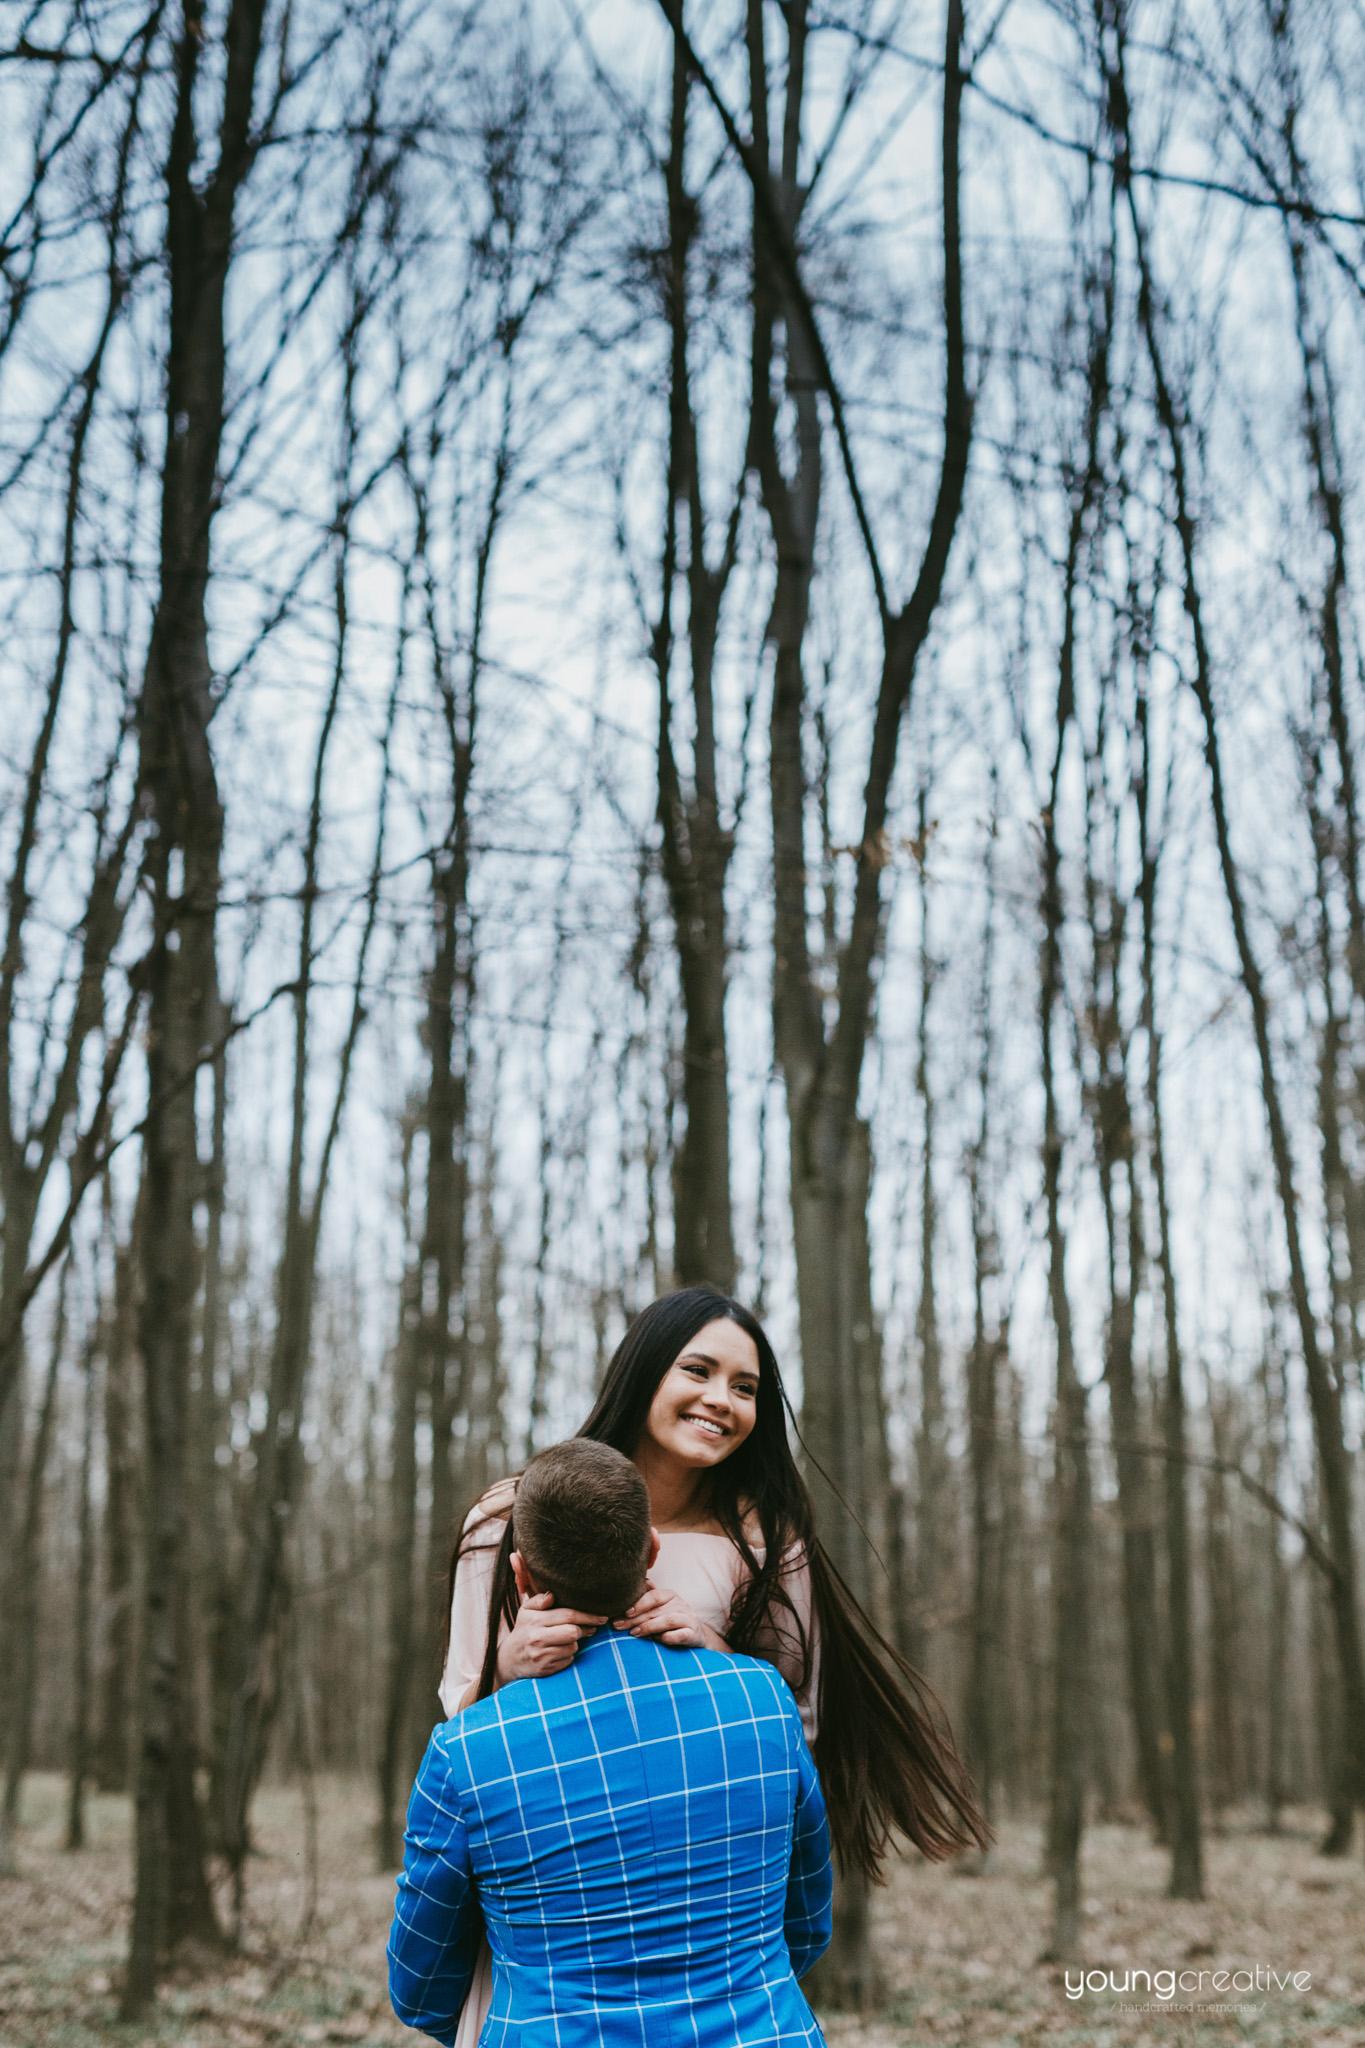 Alexandra & Cosmin | youngcreative.info media © Dan Filipciuc, Cristina Bejan | sedinta foto cuplu Iasi